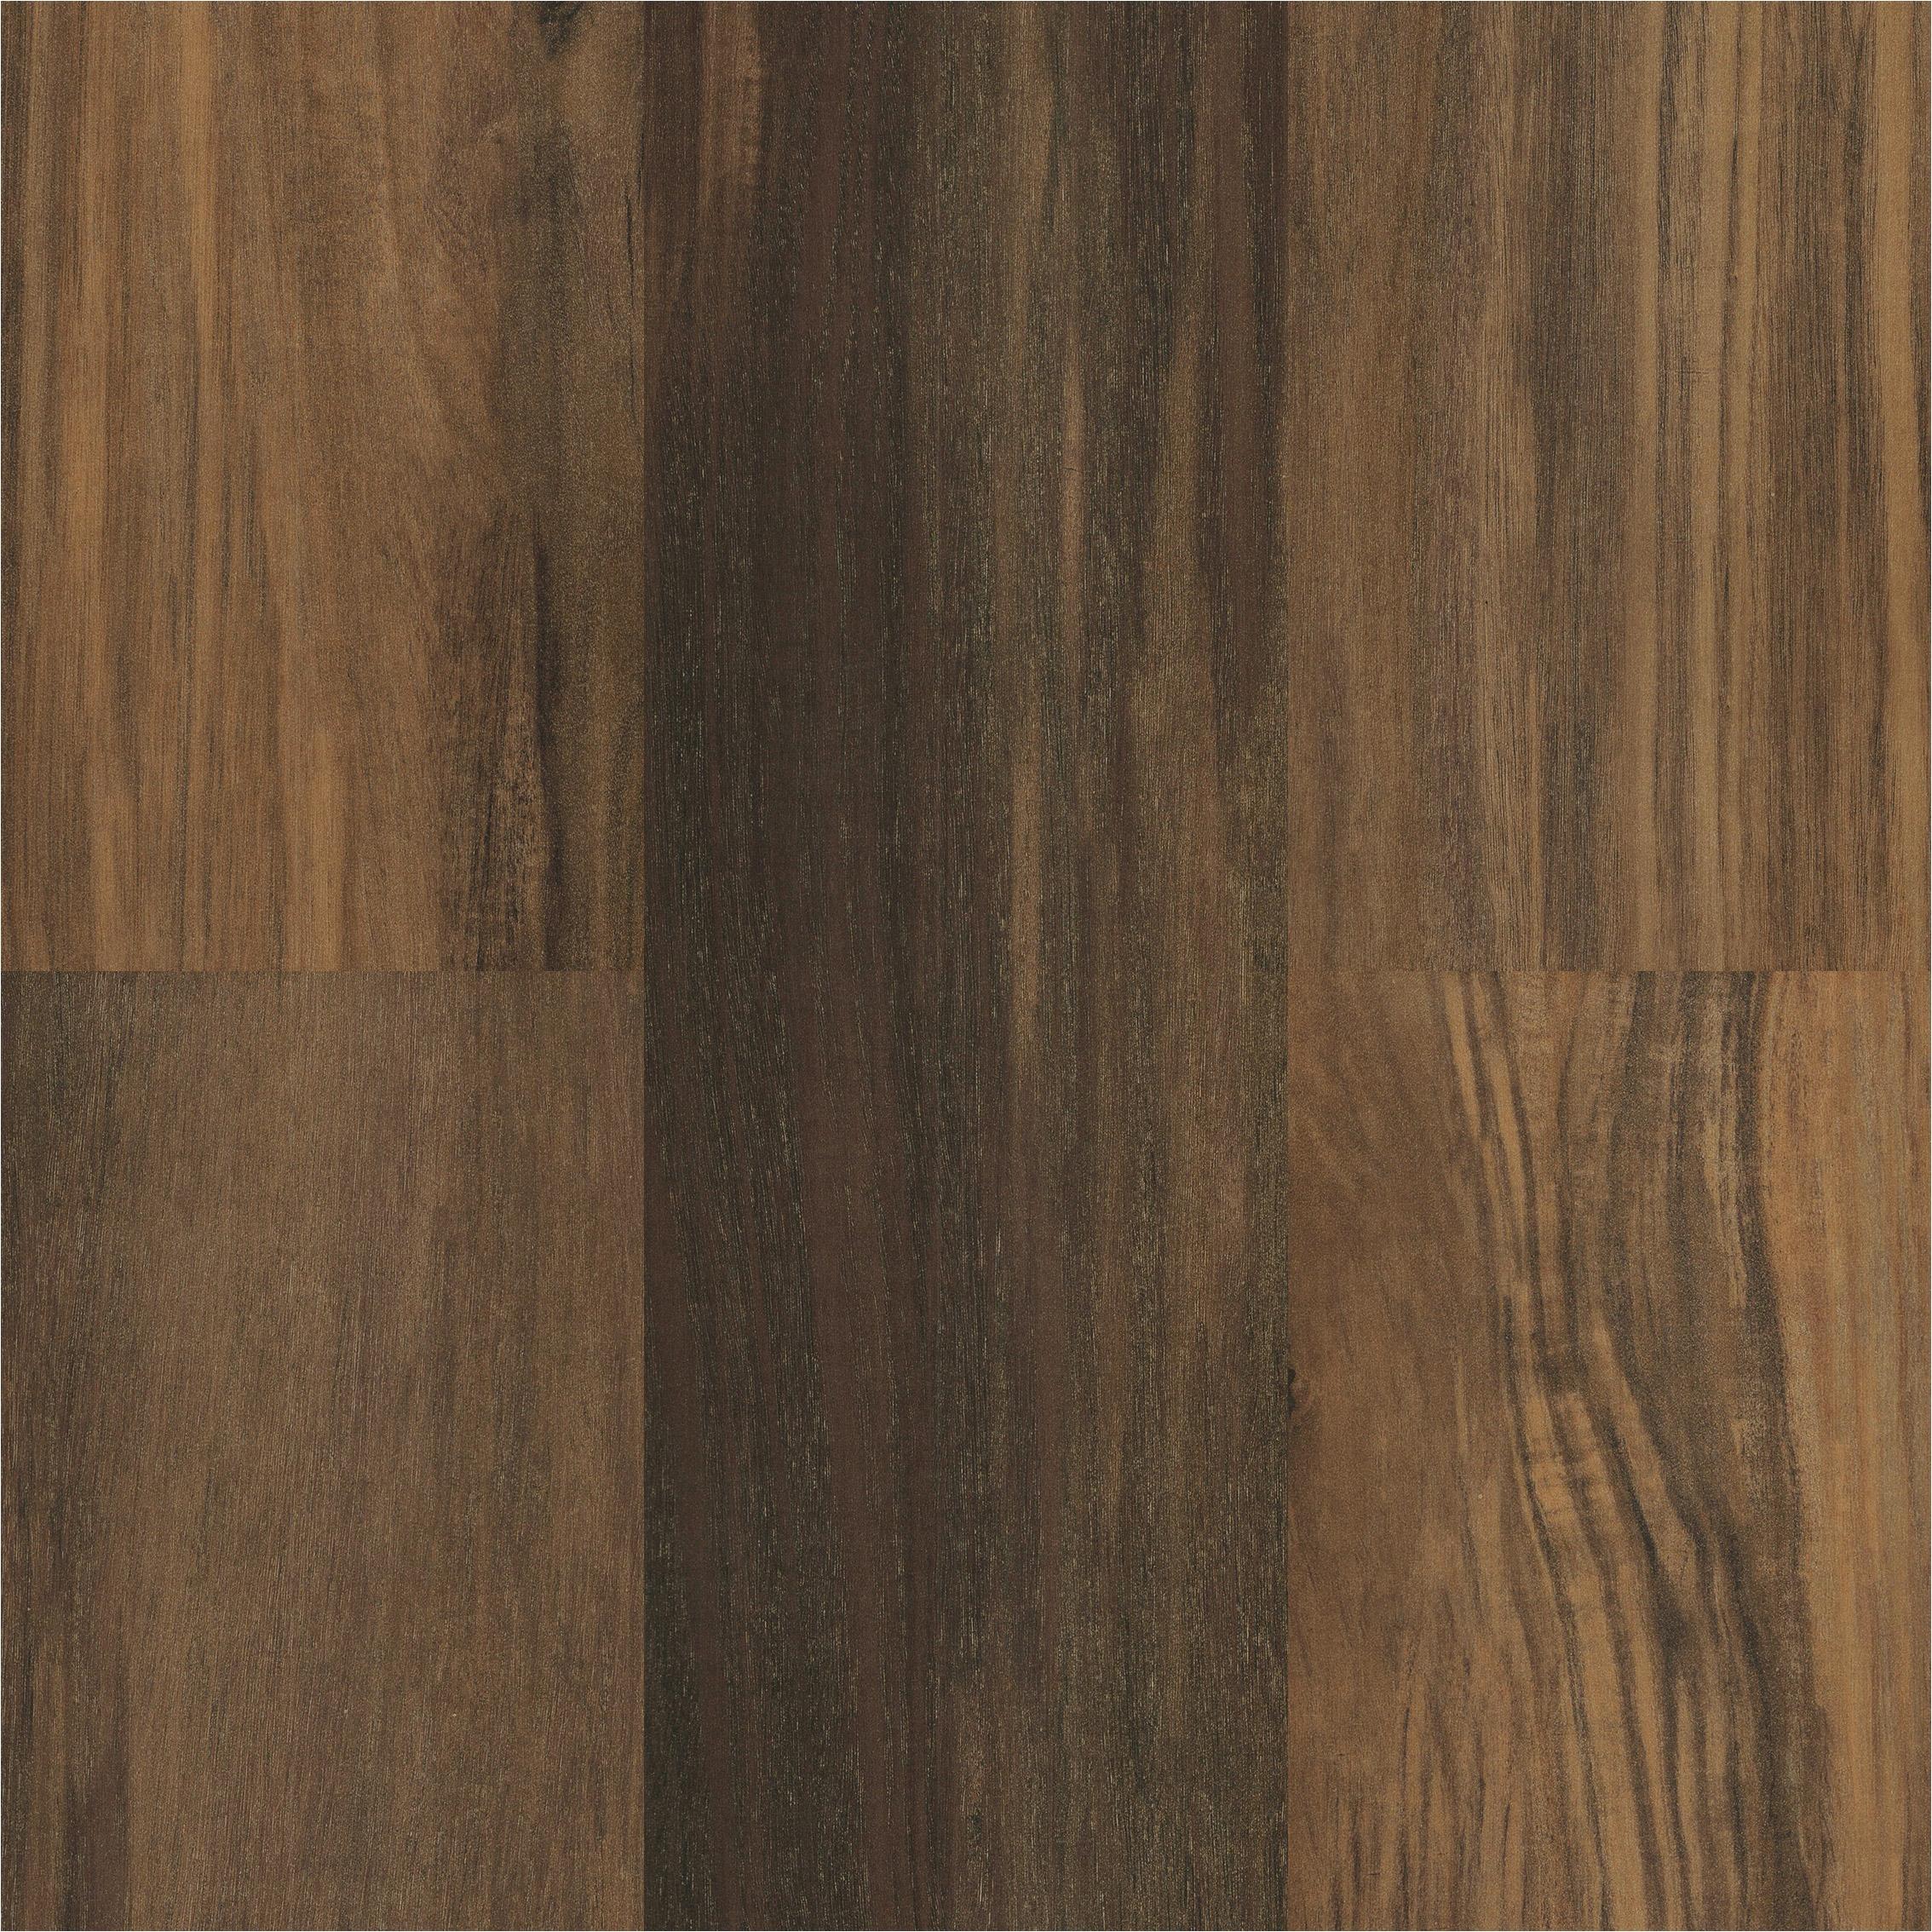 Waterproof Laminate Flooring Made In Usa Moduleo Horizon Sculpted Acacia 7 56 Luxury Vinyl Plank Flooring 60142